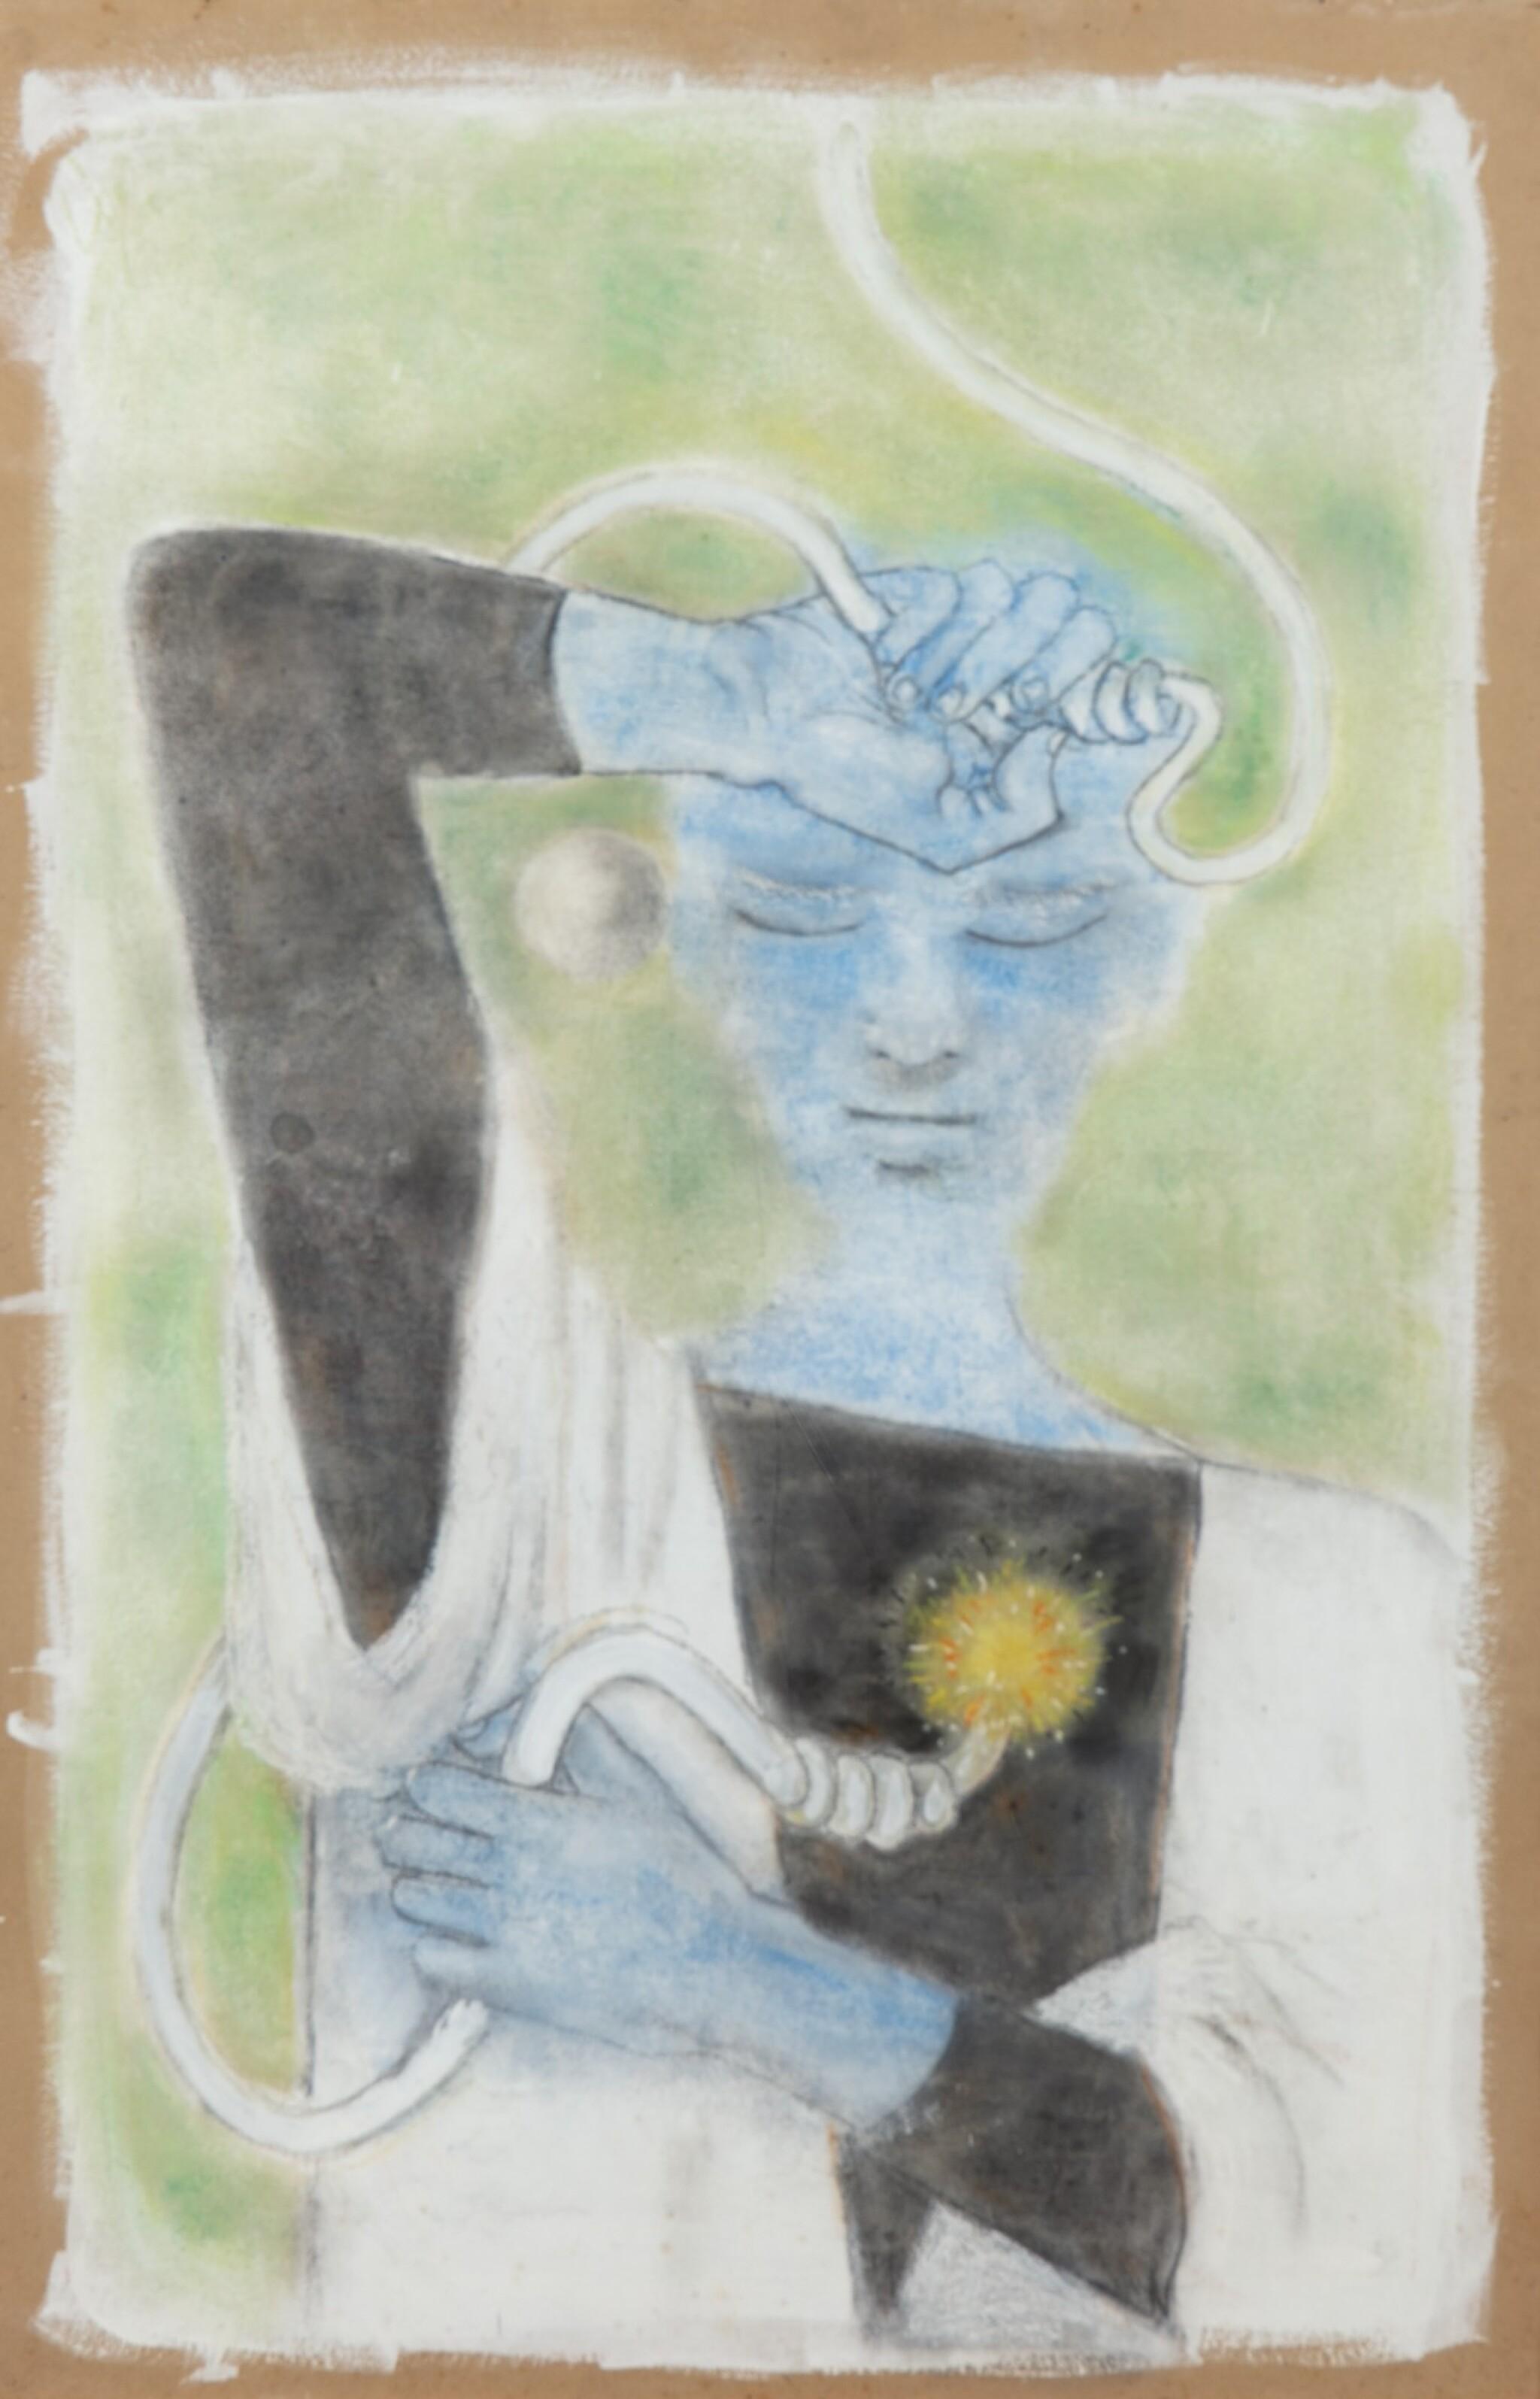 View full screen - View 1 of Lot 34. JEAN COCTEAU. Astrologue III. Le Feu. [1954]. Technique mixte sur isorel. 120 x 77 cm..